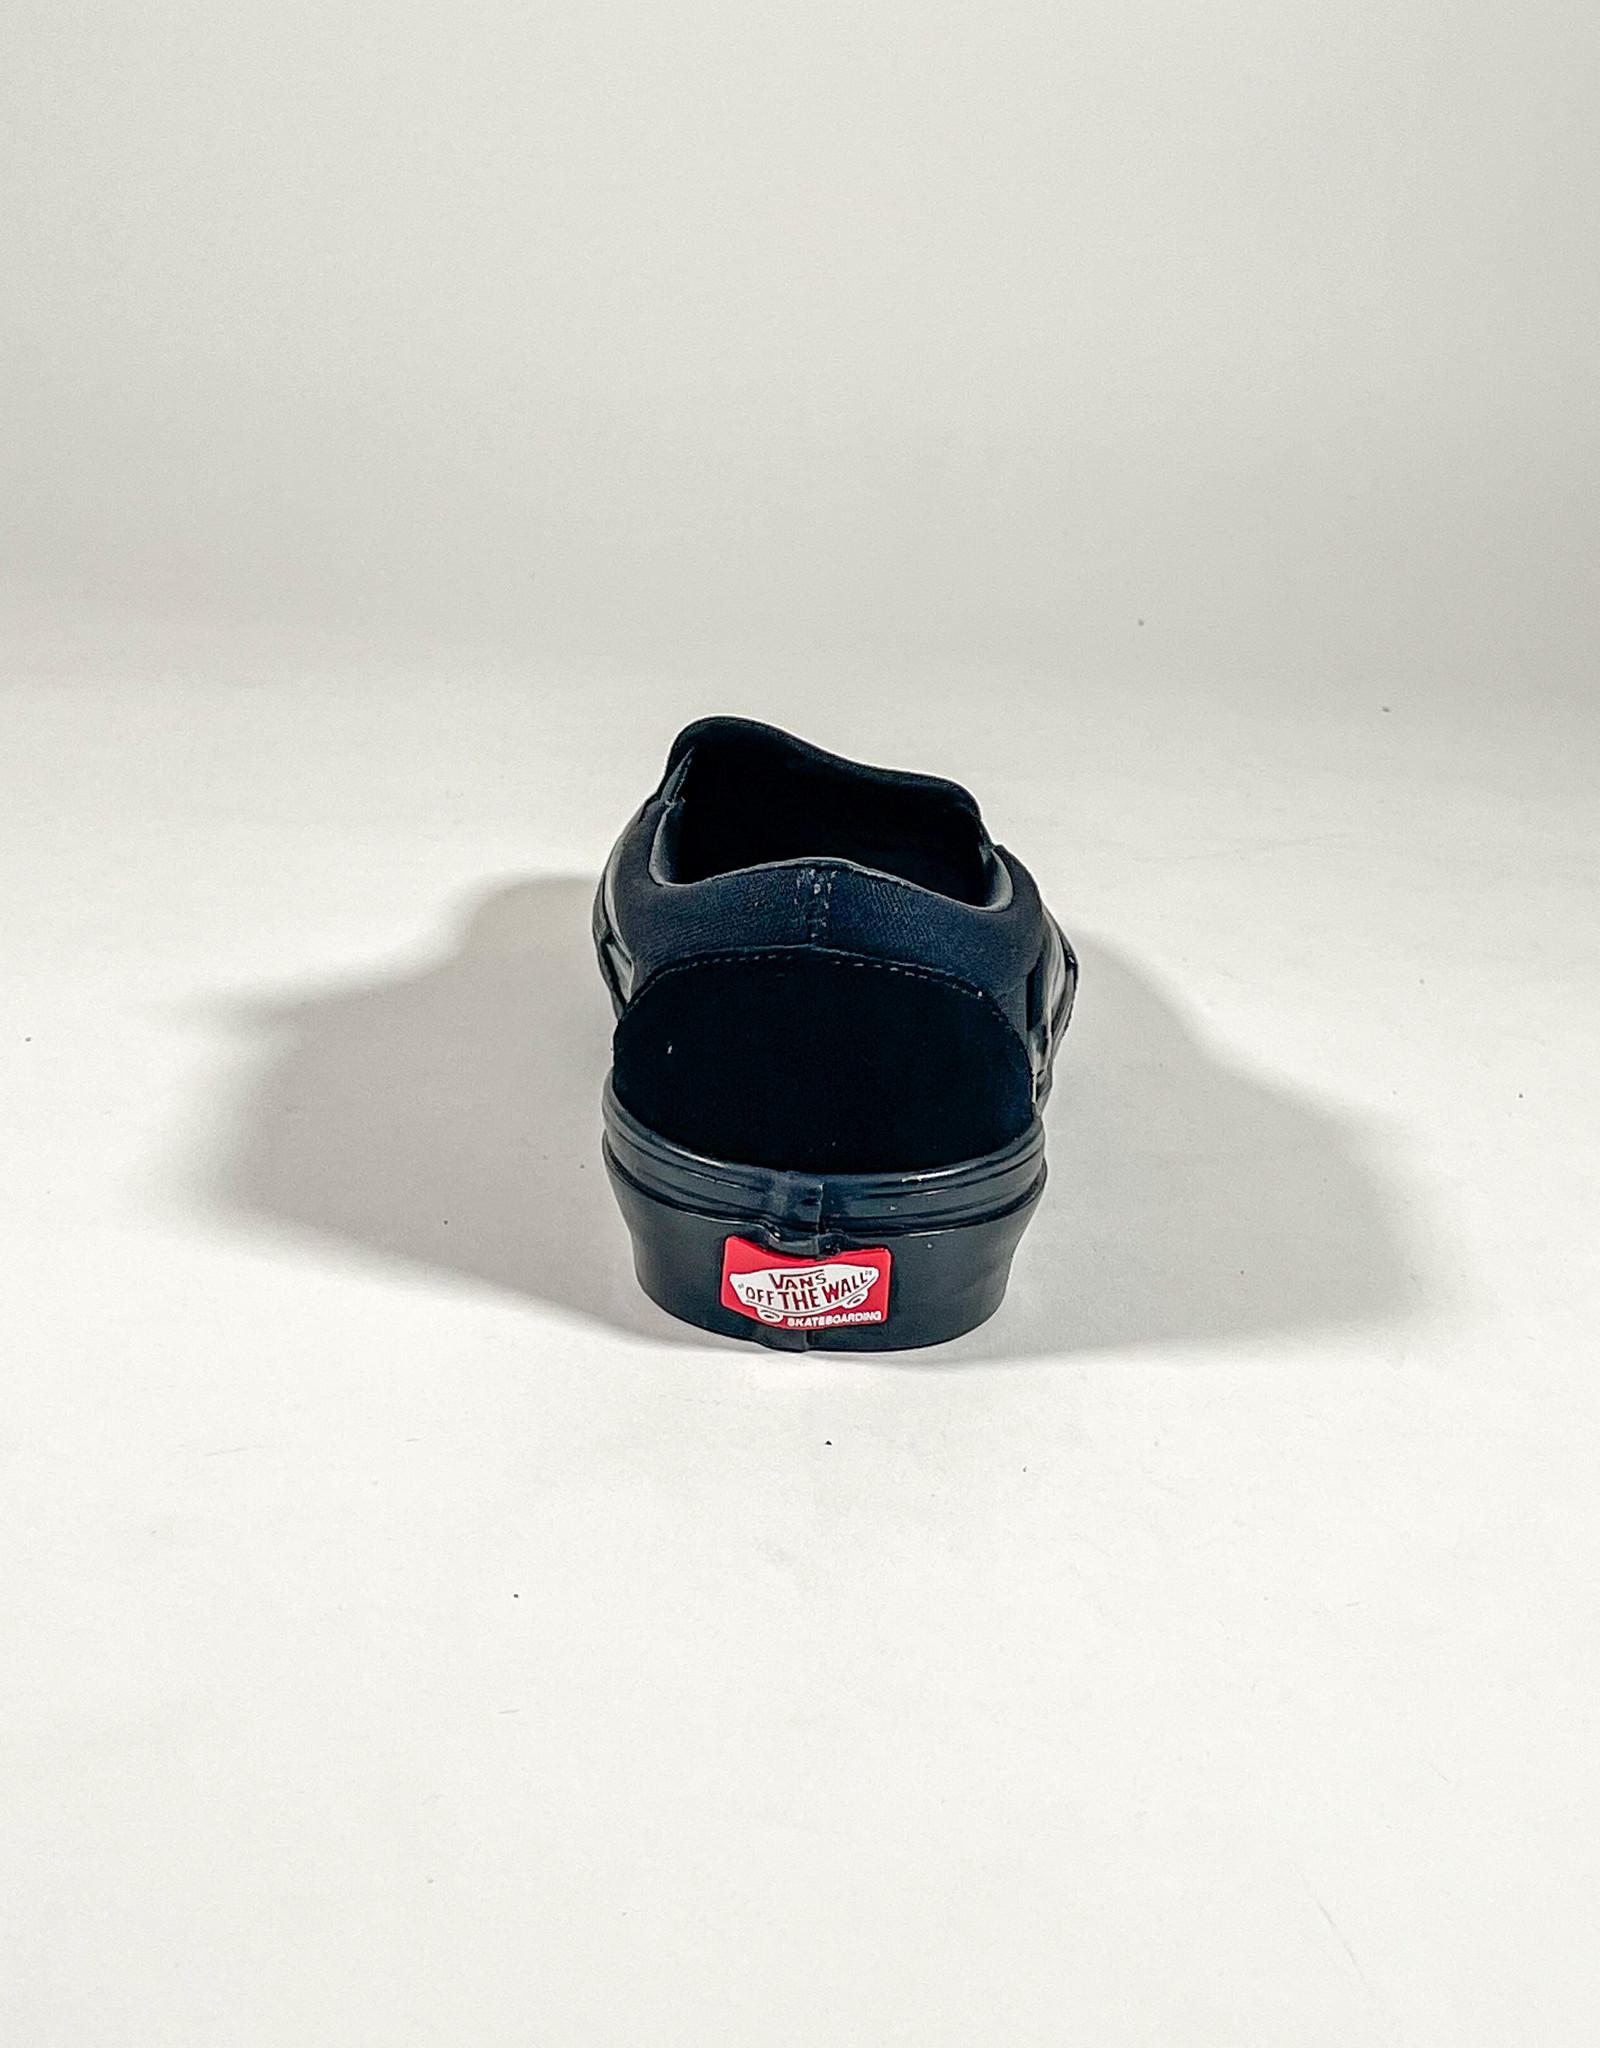 VANS VANS SKATE SLIP ON - BLACK/BLACK